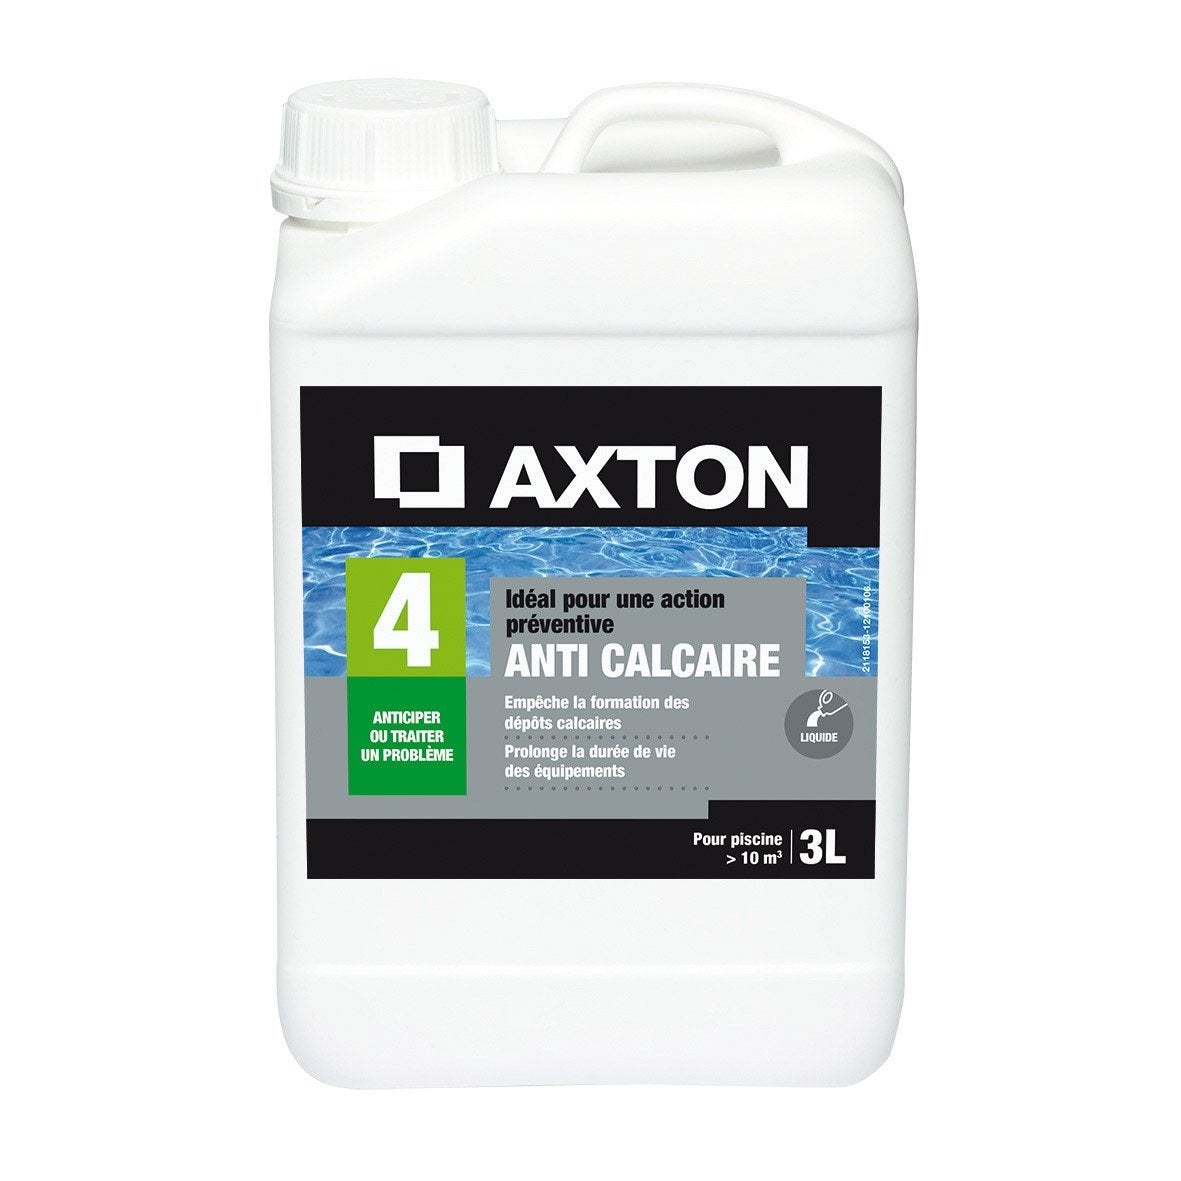 anticalcaire piscine axton liquide 3 l 3 kg leroy merlin. Black Bedroom Furniture Sets. Home Design Ideas